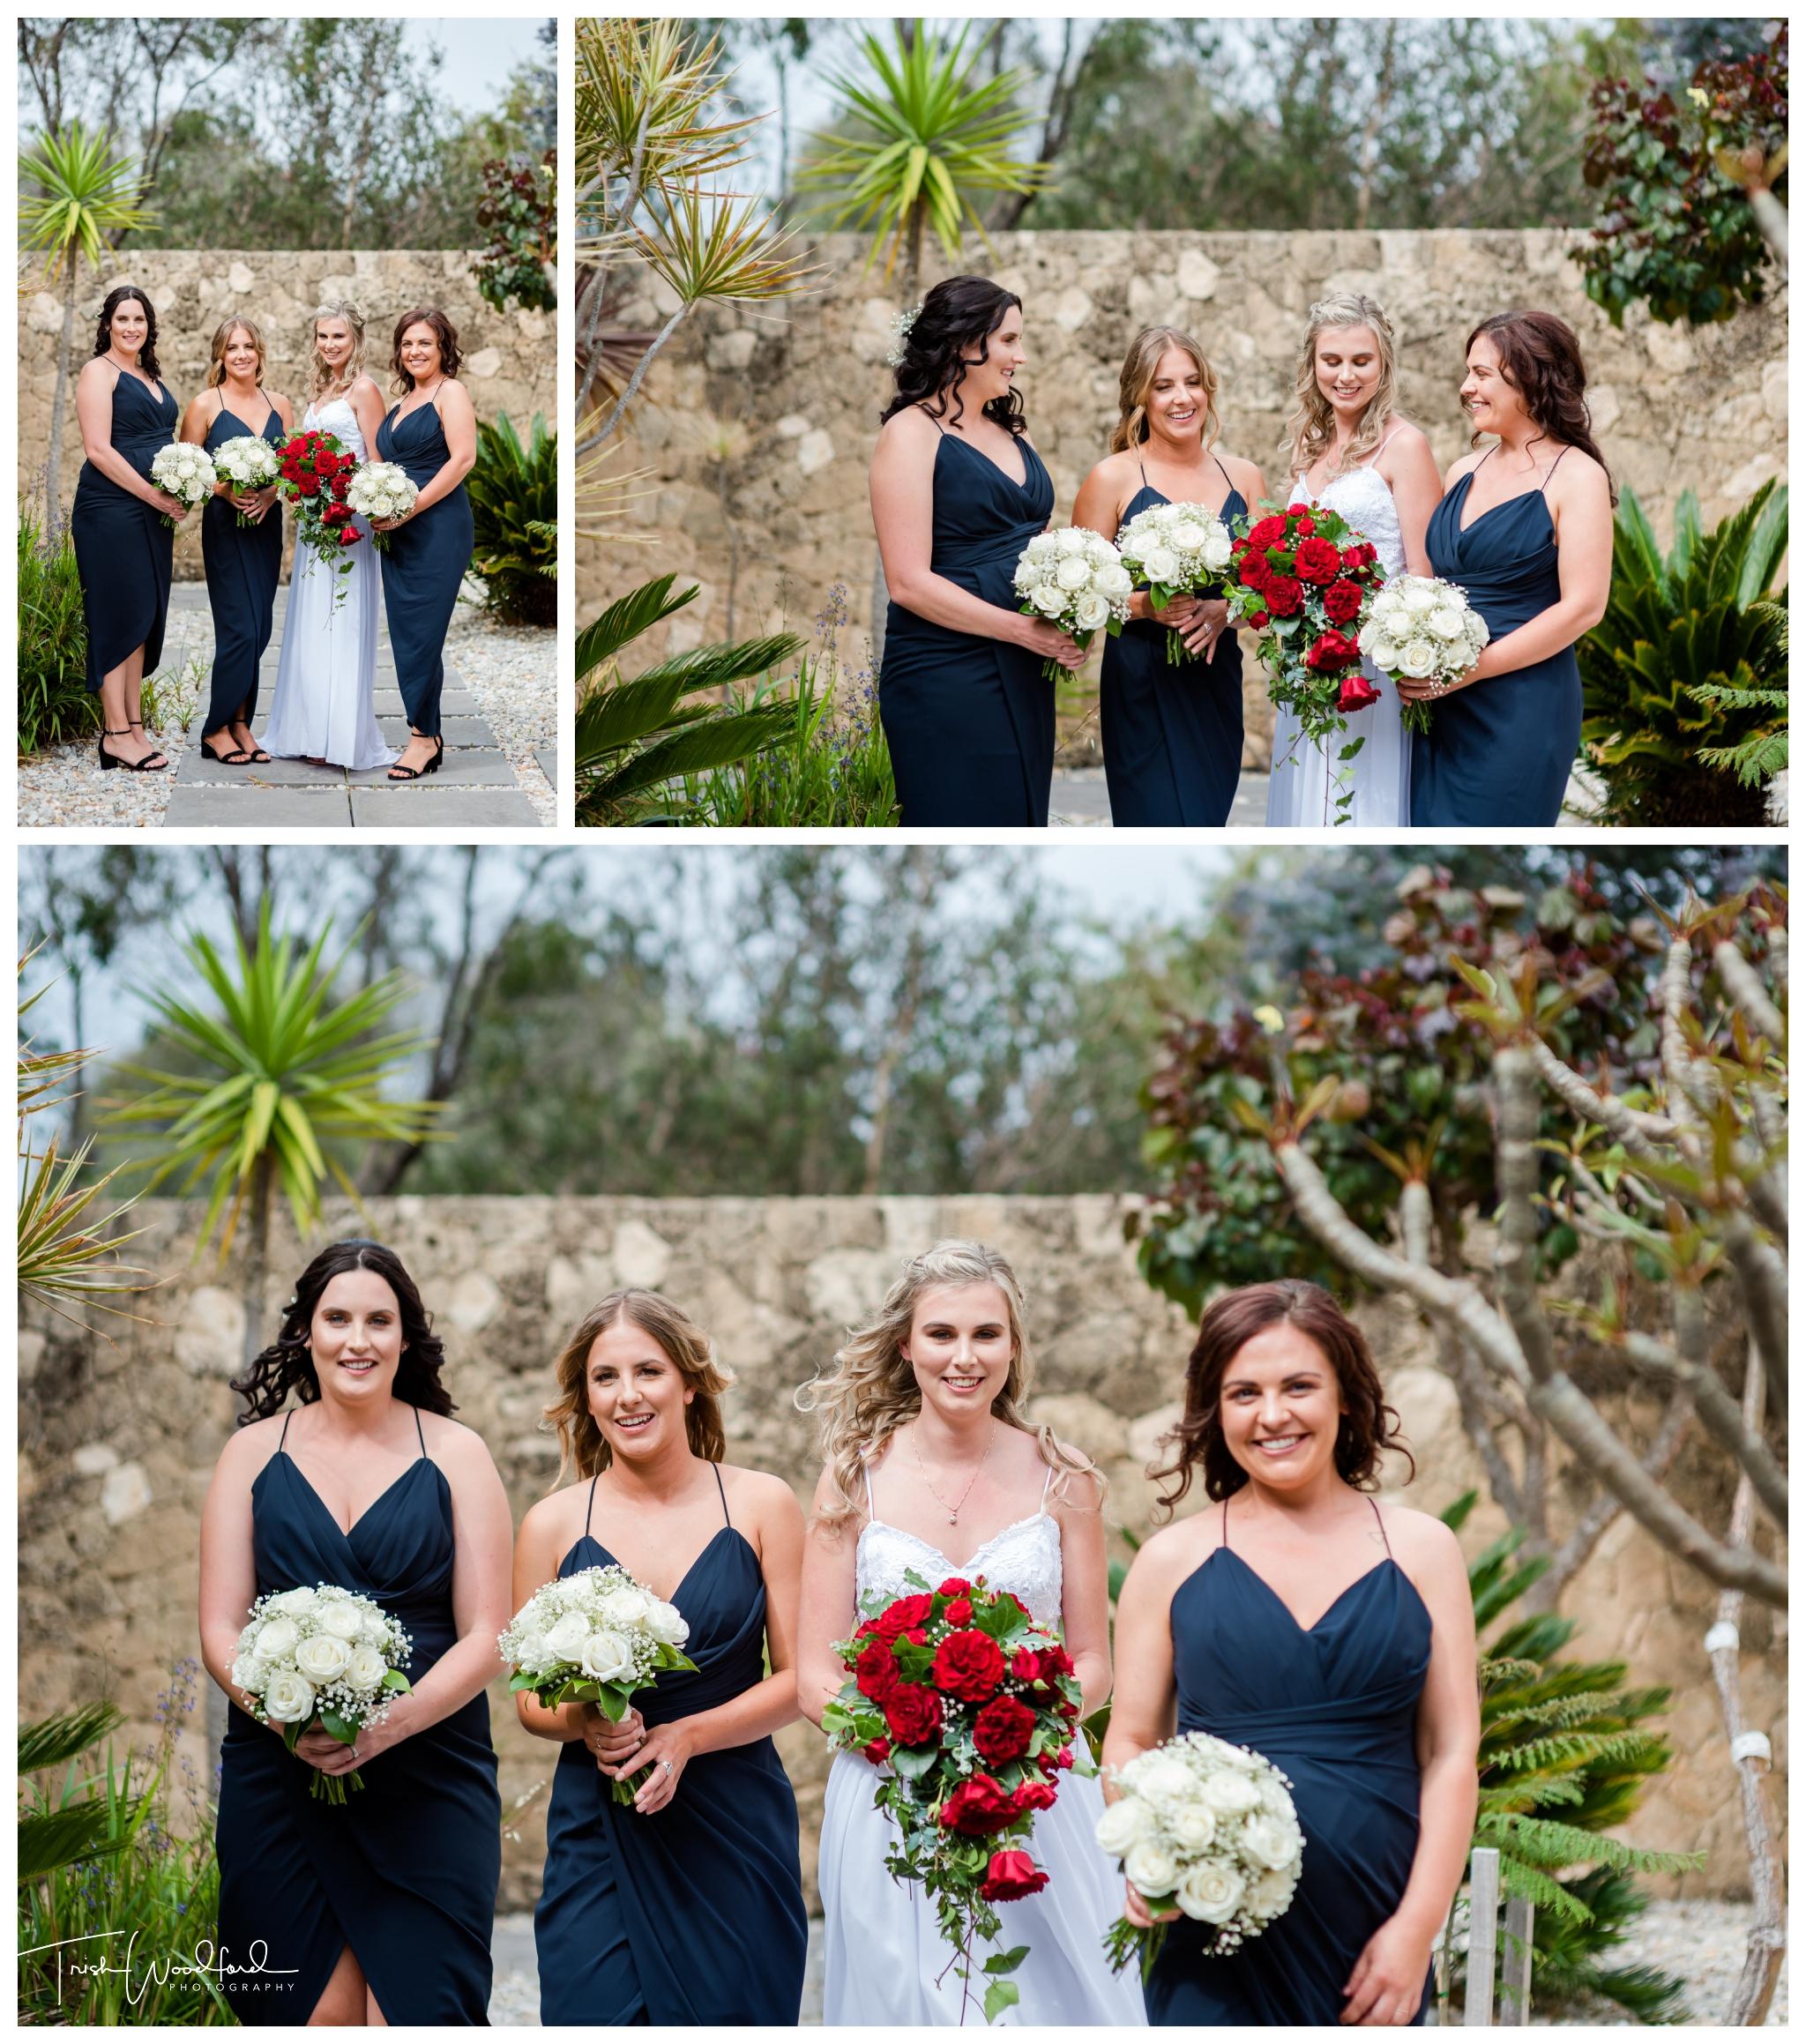 Bride and Bridesmaids Yallingup Wedding